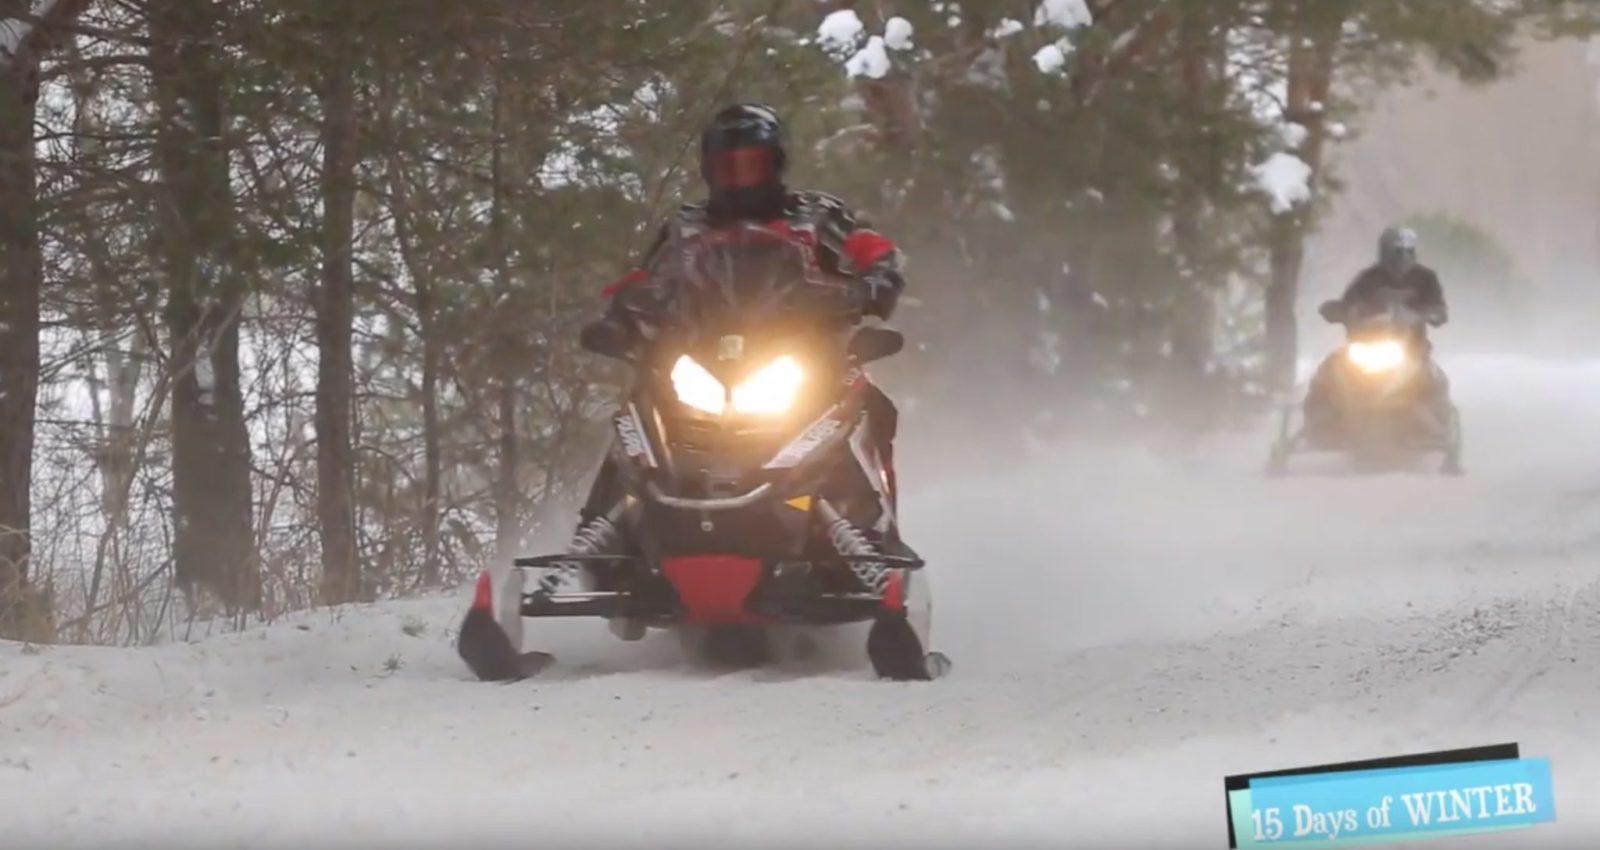 Haliburton County Snowmobile Association